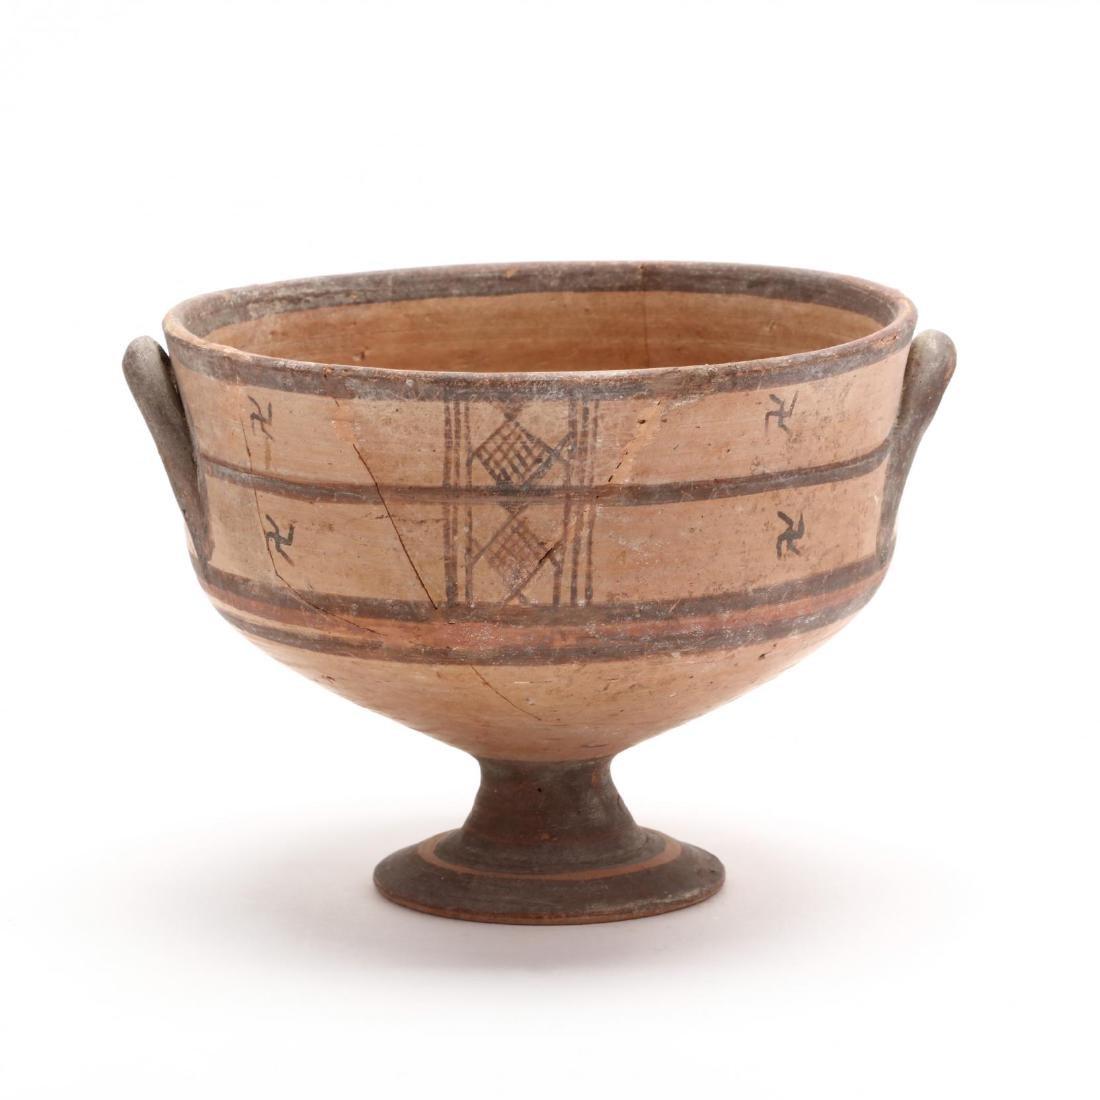 Cypro-Geometric Stemmed Bowl